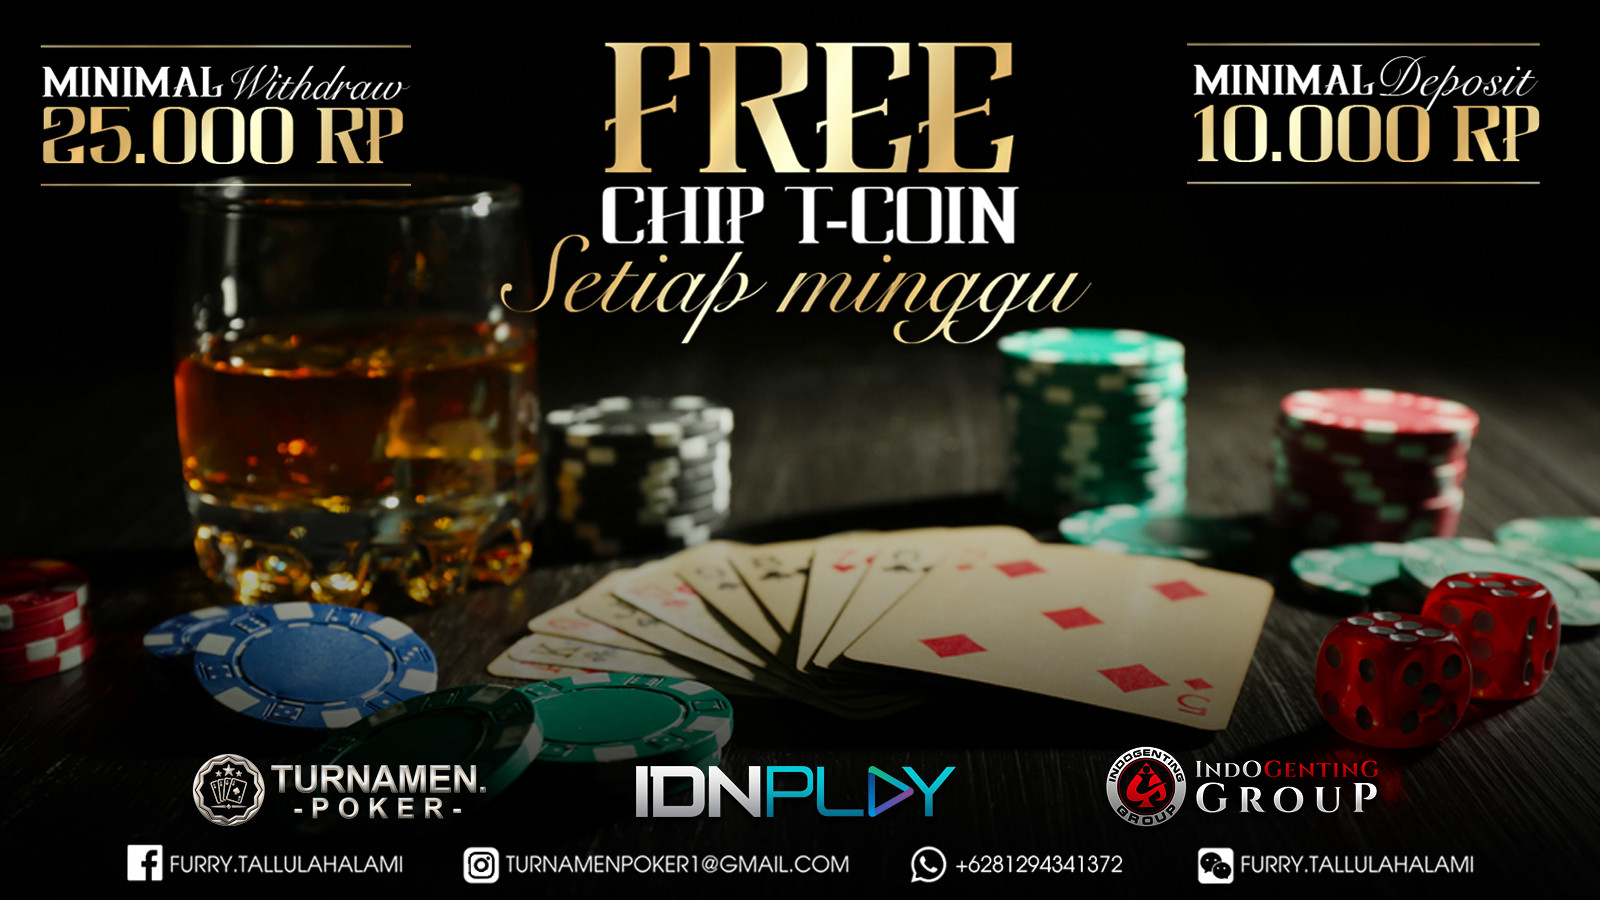 Turnamen Poker Online Situs Daftar Agen Judi Poker Online Indonesia